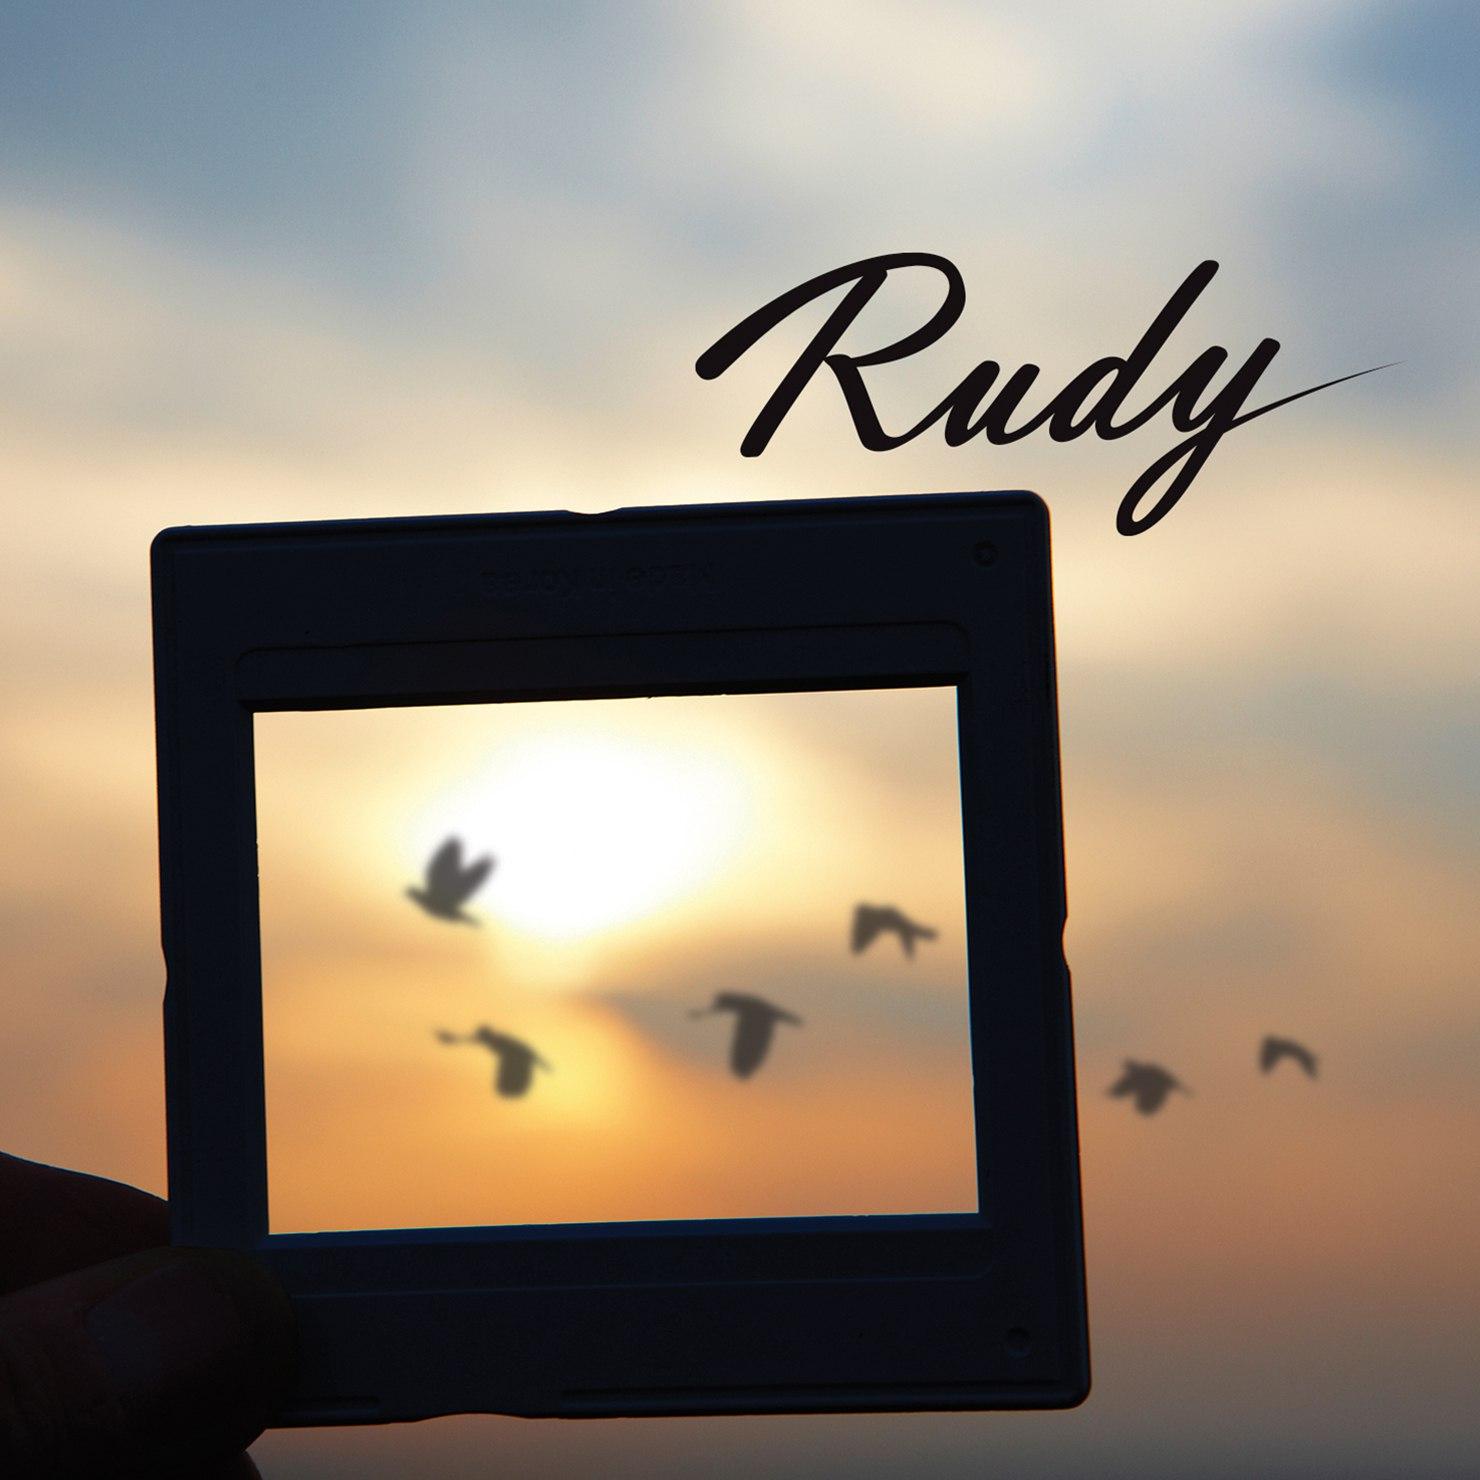 Обзор новинок из Кореи Rudy